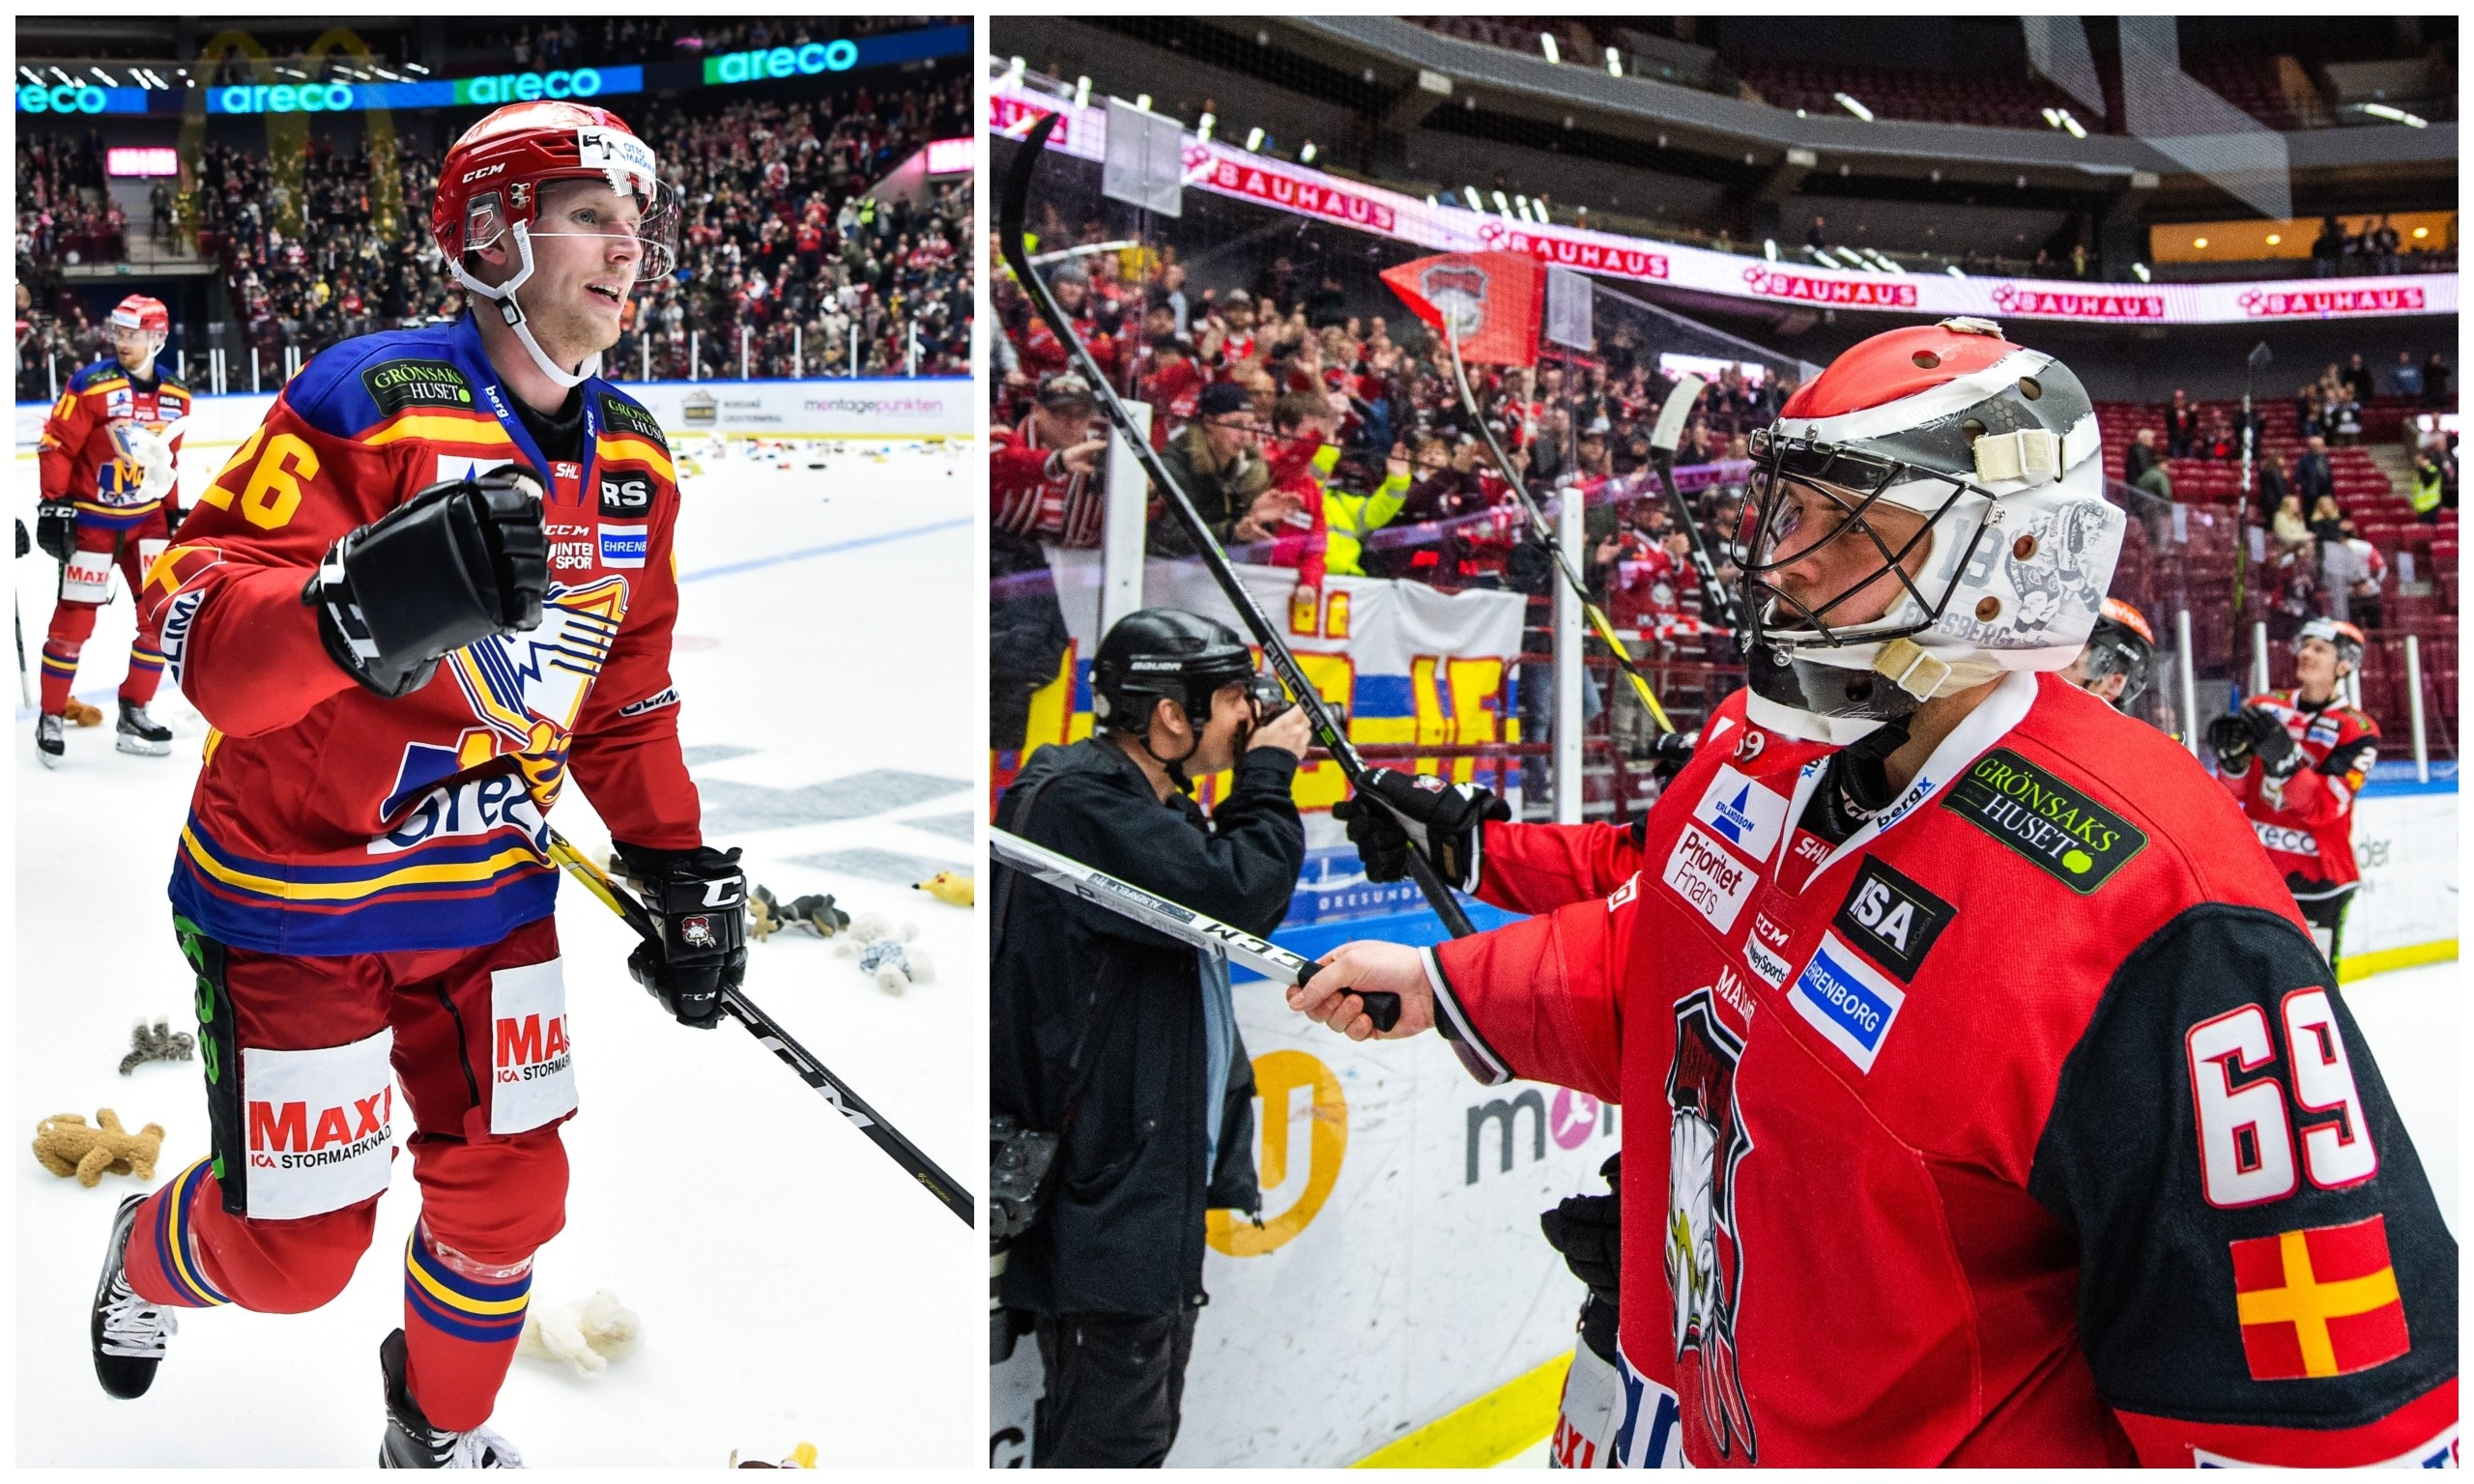 Nallefest utan Malmö Redhawks målvaktsstjärna